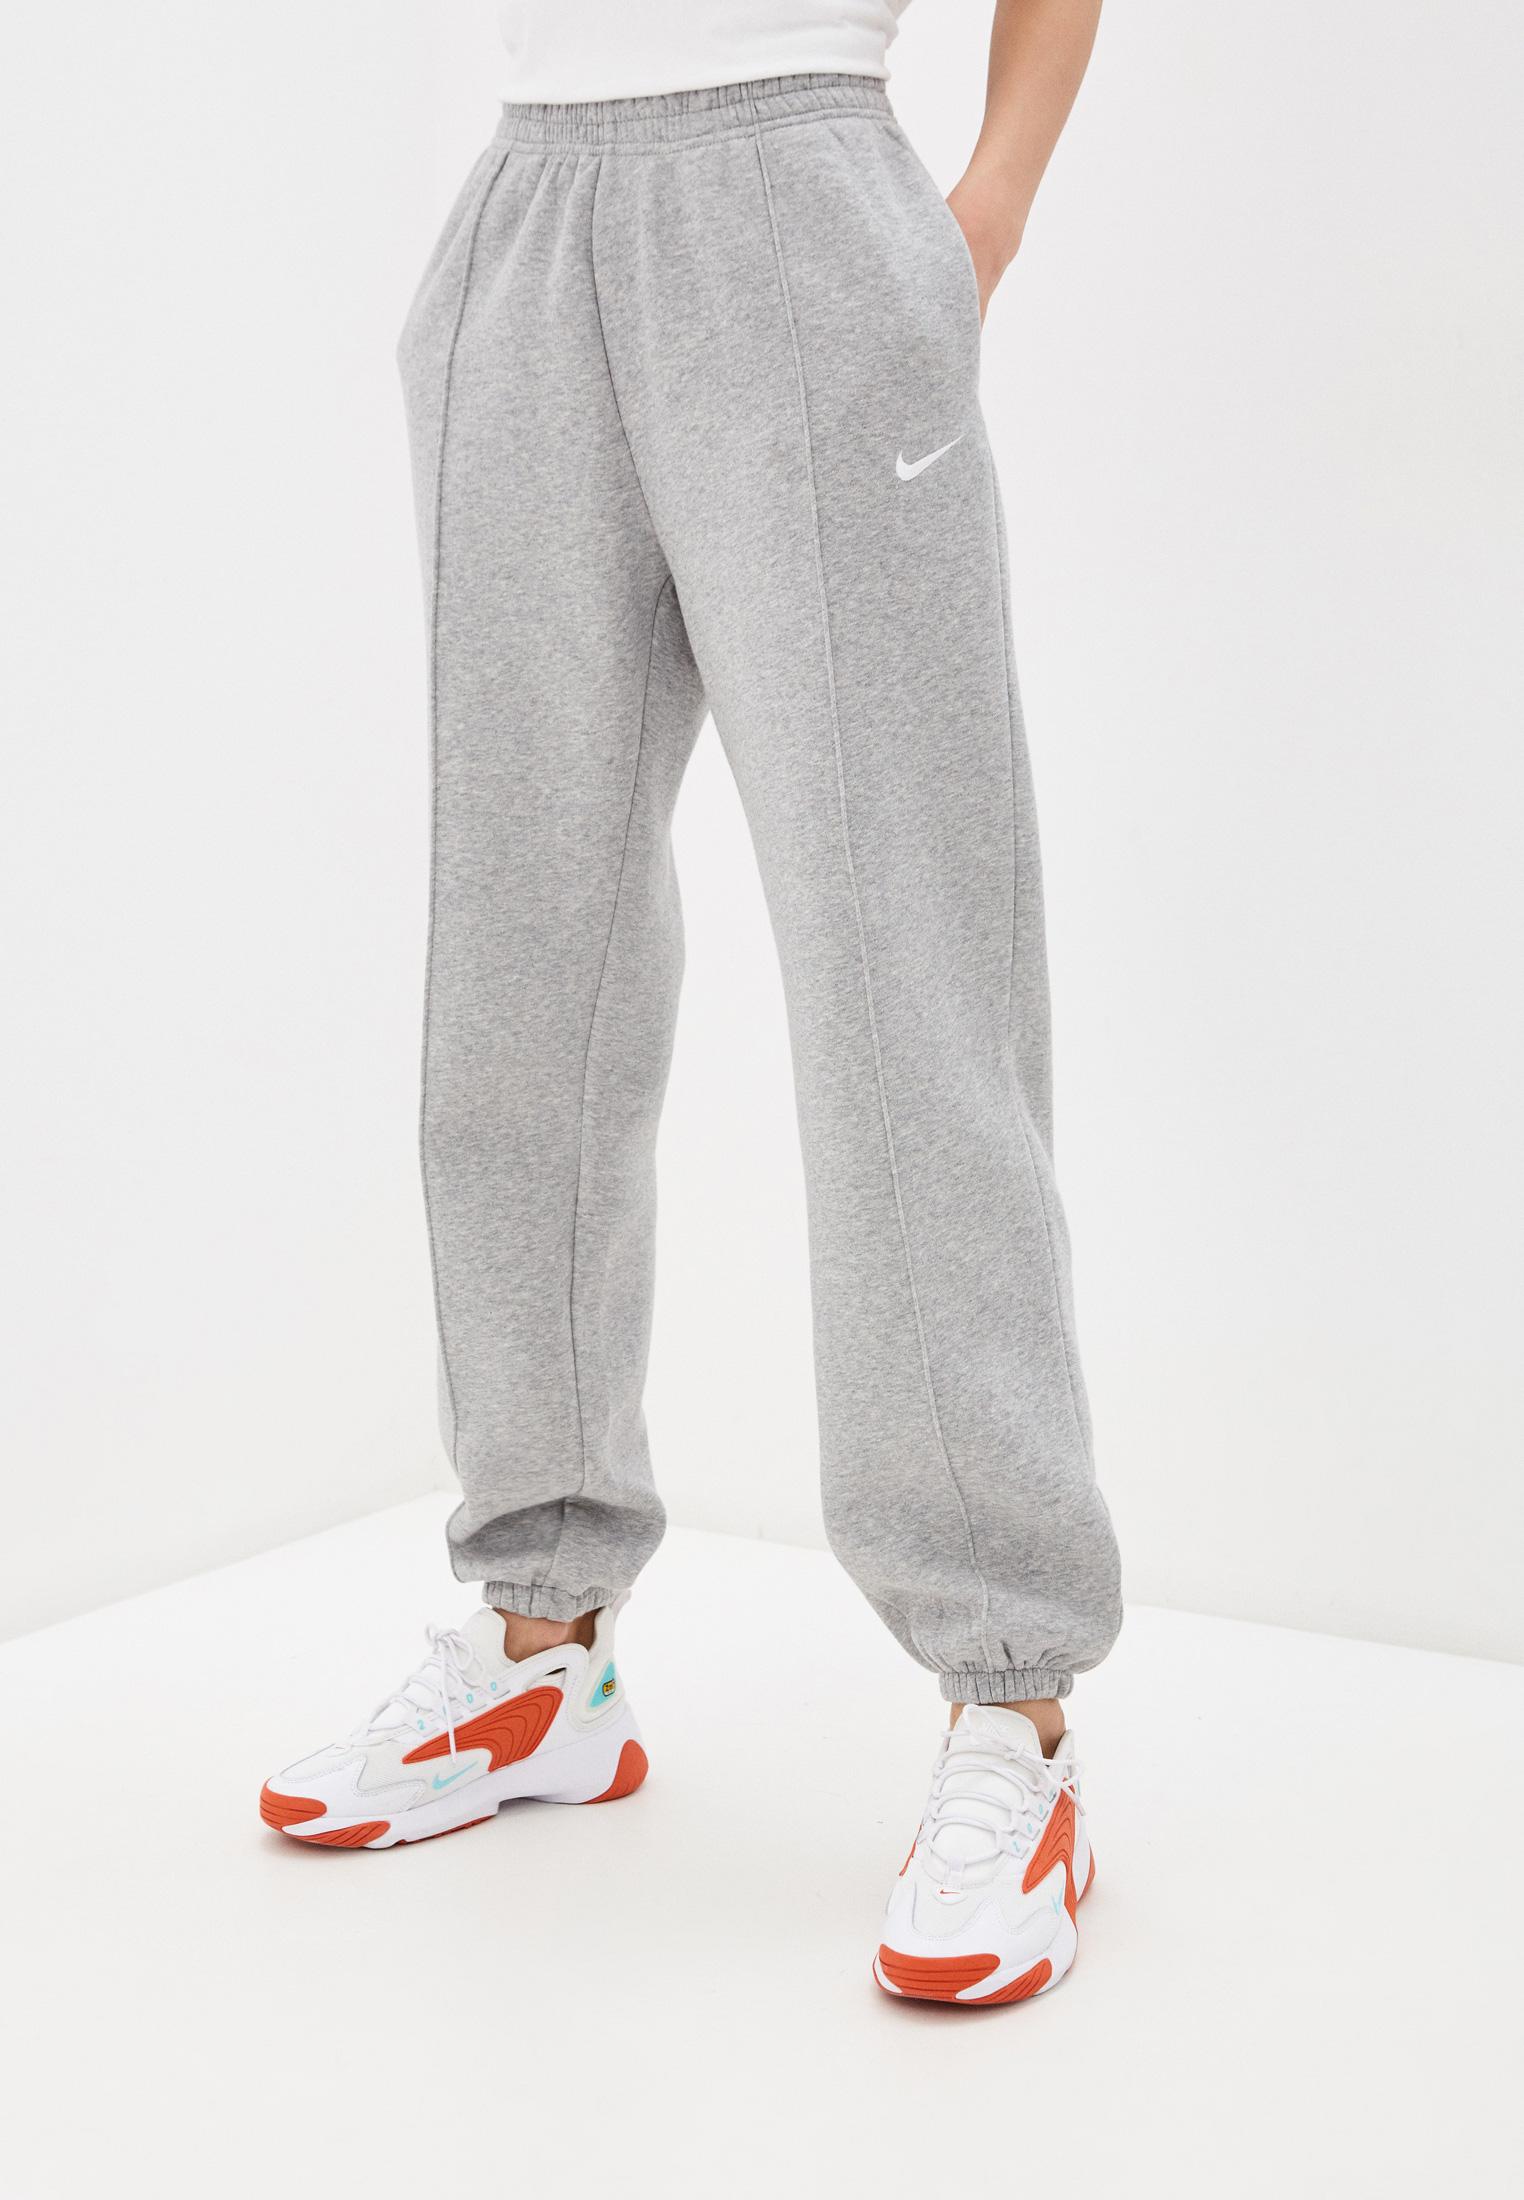 Брюки спортивные Nike W NSW PANT FLC TREND купить за 3 699 ₽ в интернет-магазине Lamoda.ru